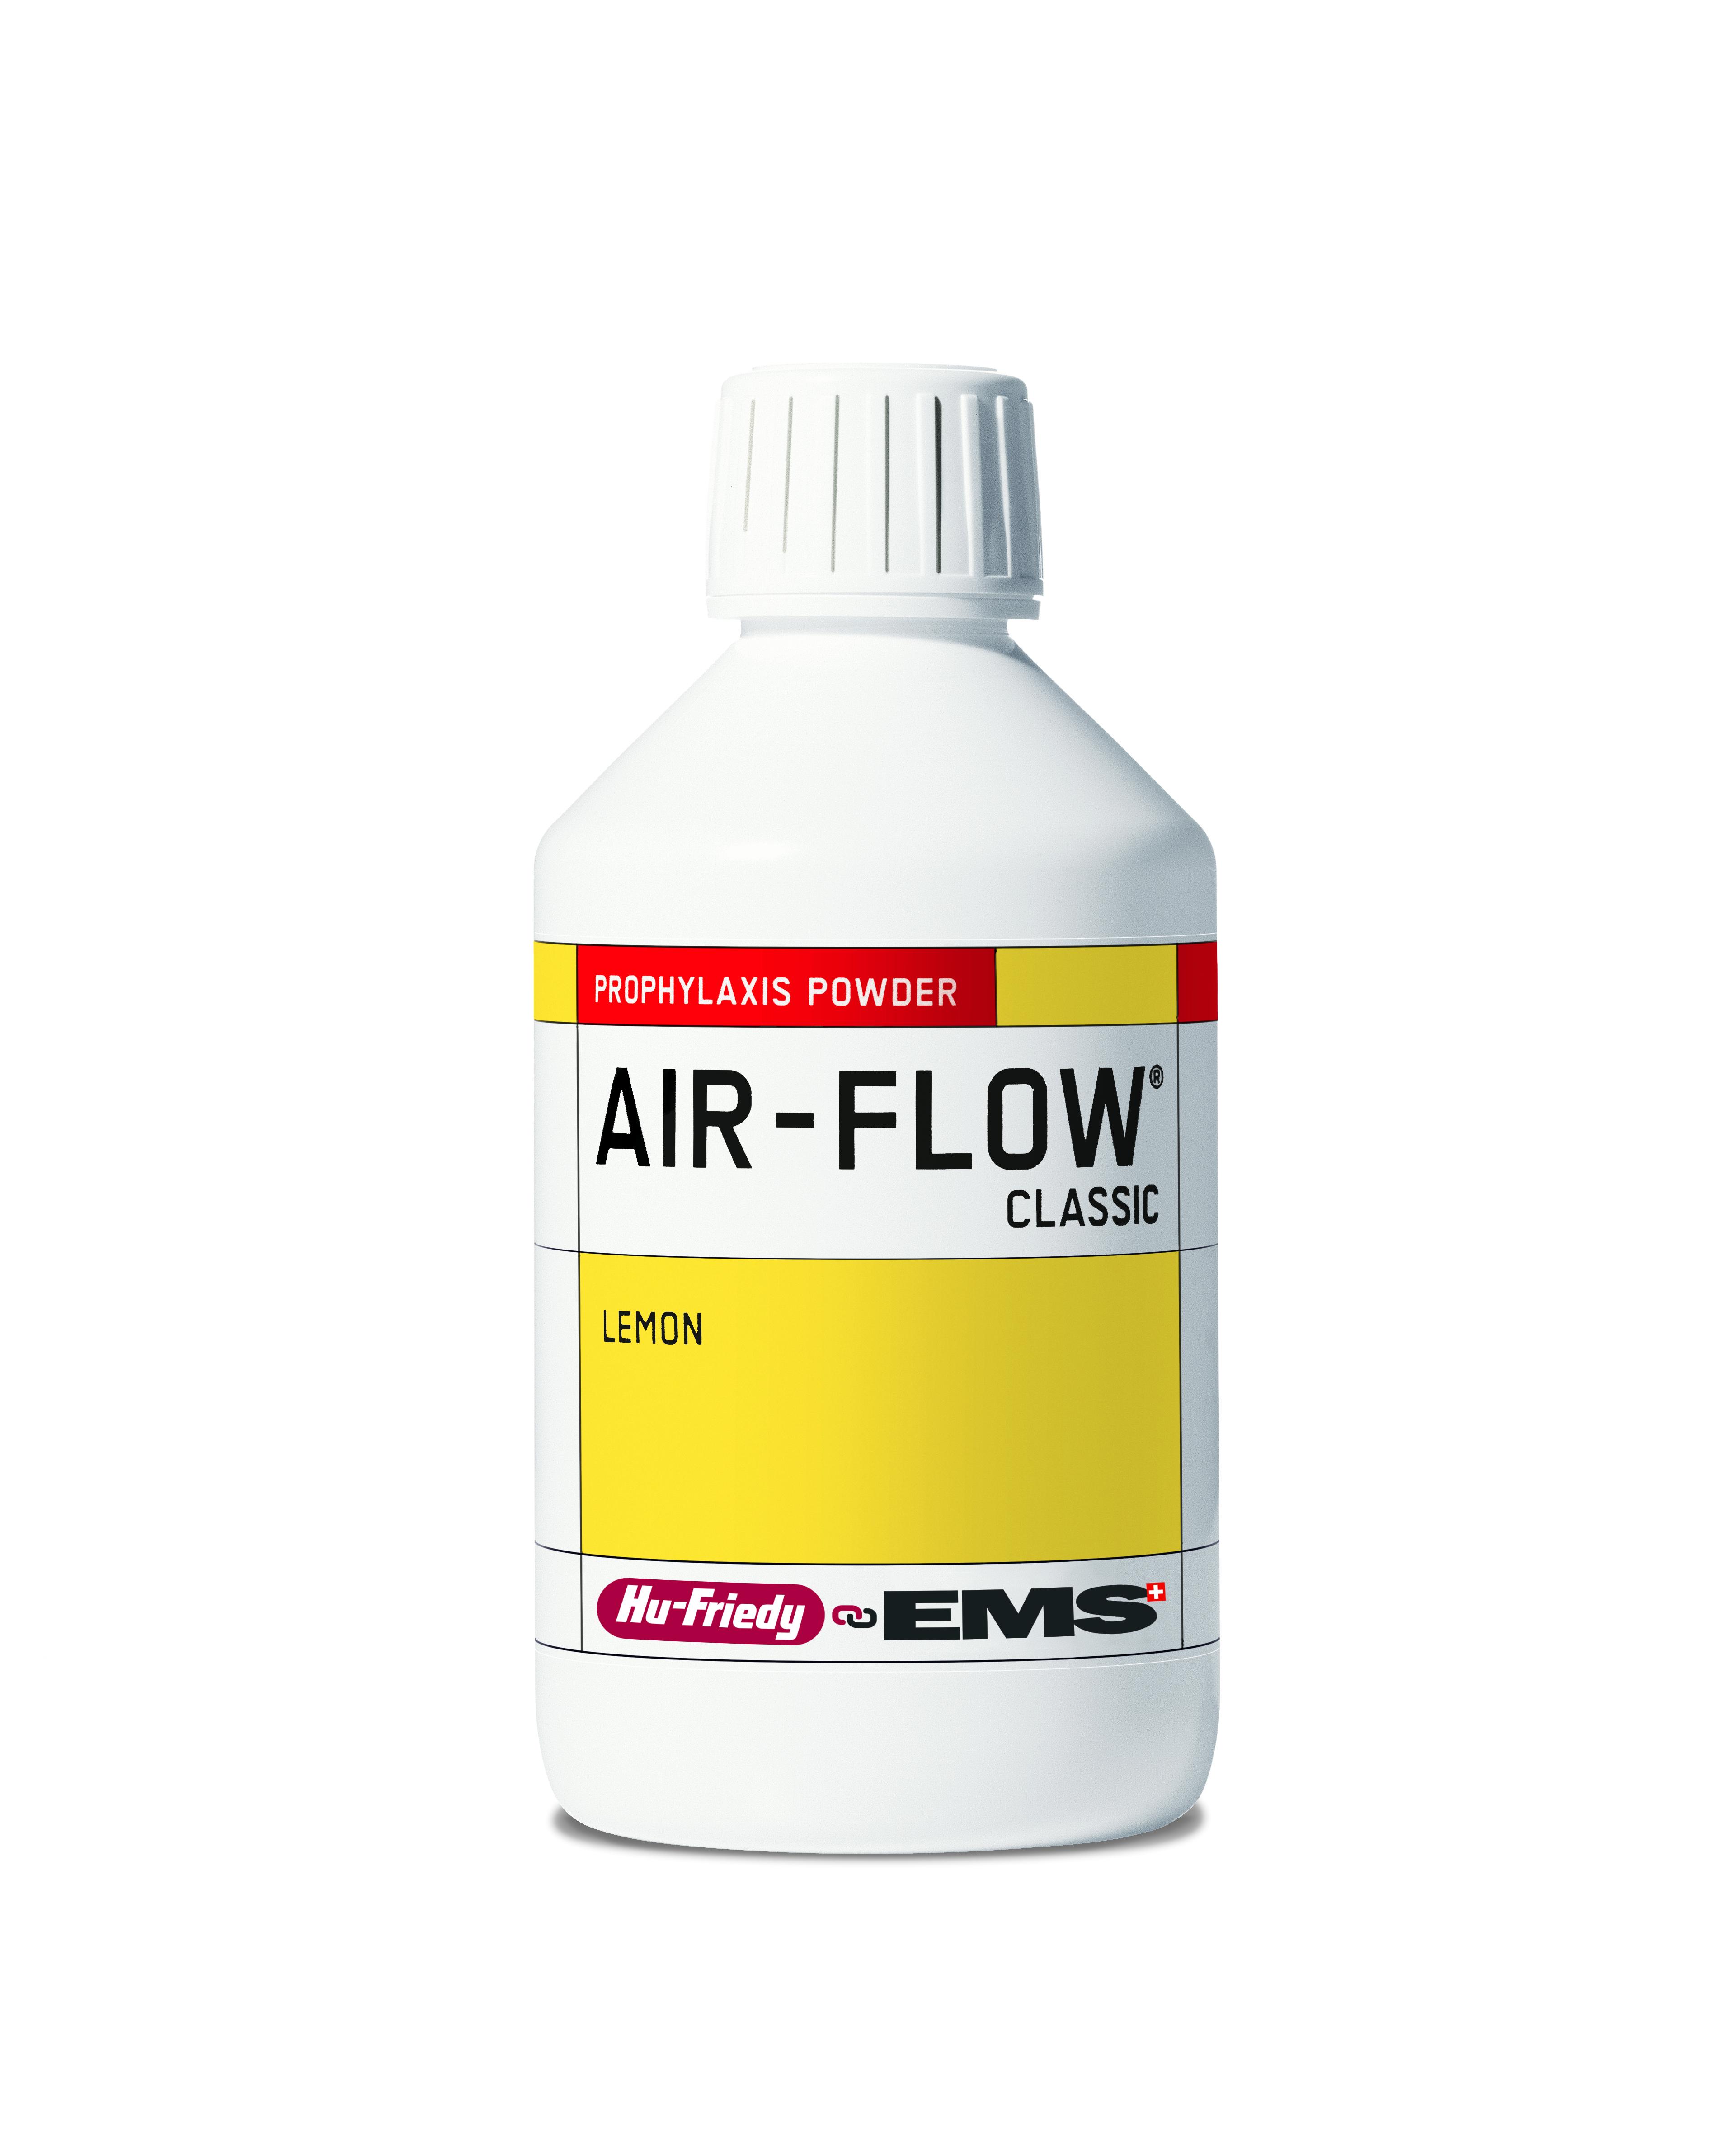 Hu-Friedy EMS AIR-FLOW Classic Powder